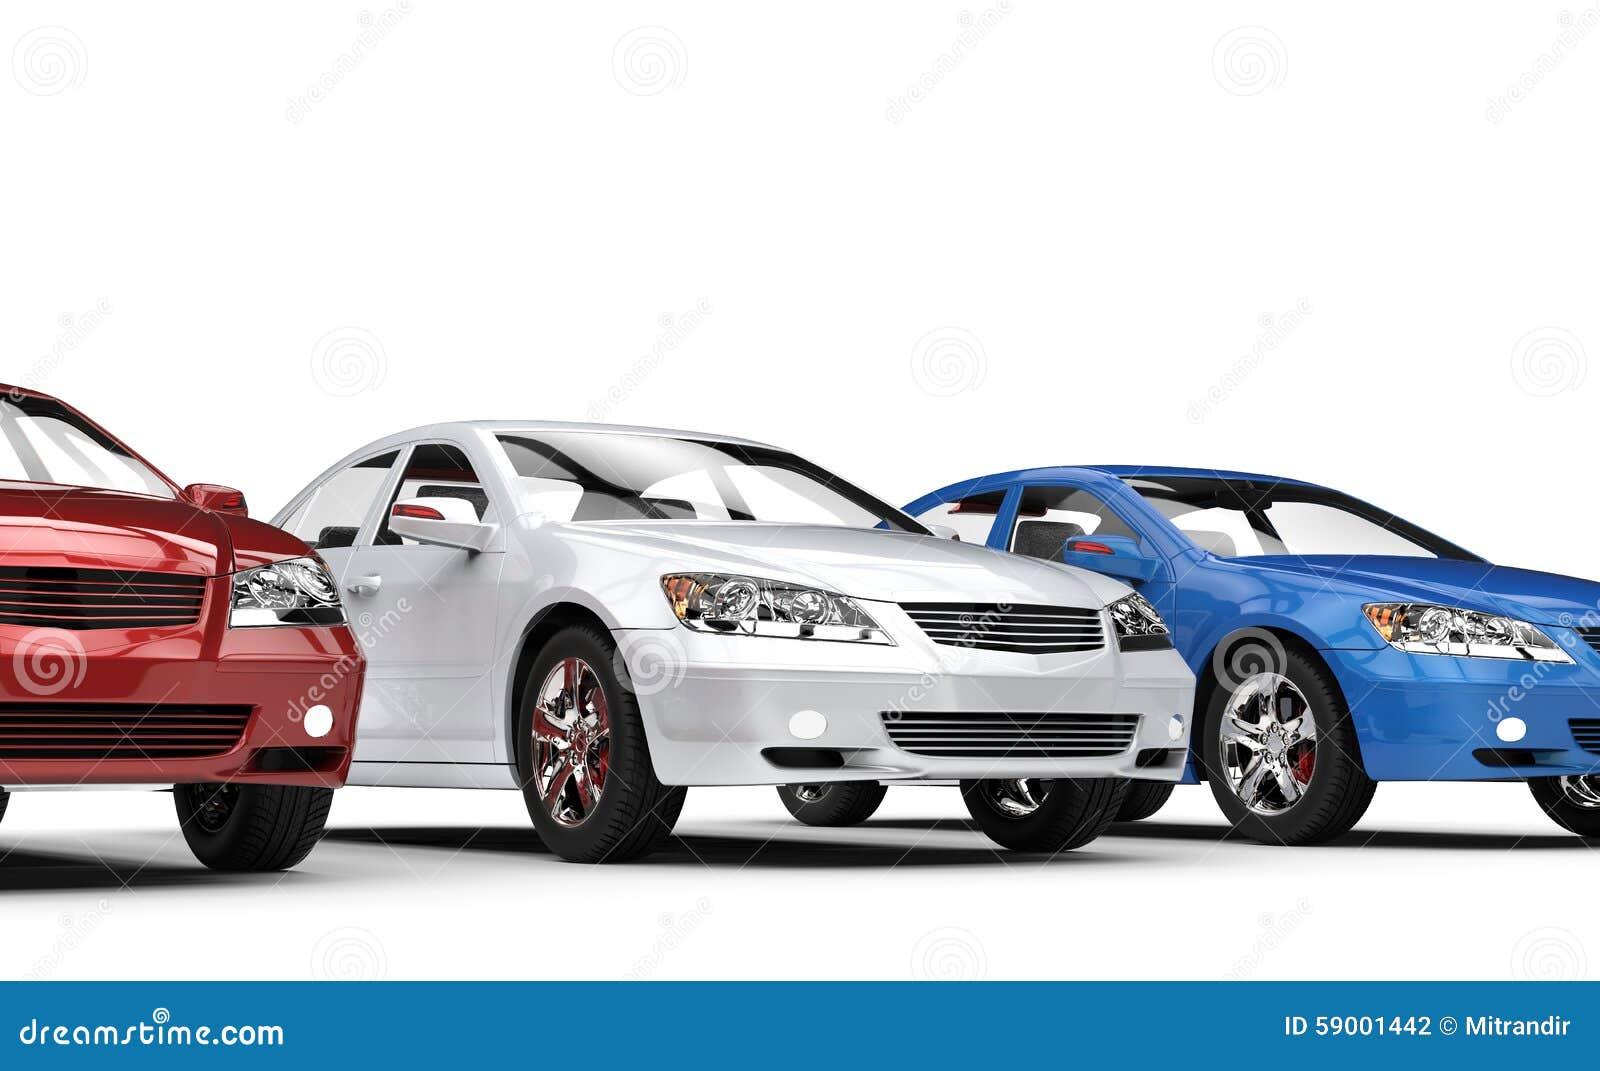 red white and blue cars stock illustration image of motor 59001442. Black Bedroom Furniture Sets. Home Design Ideas